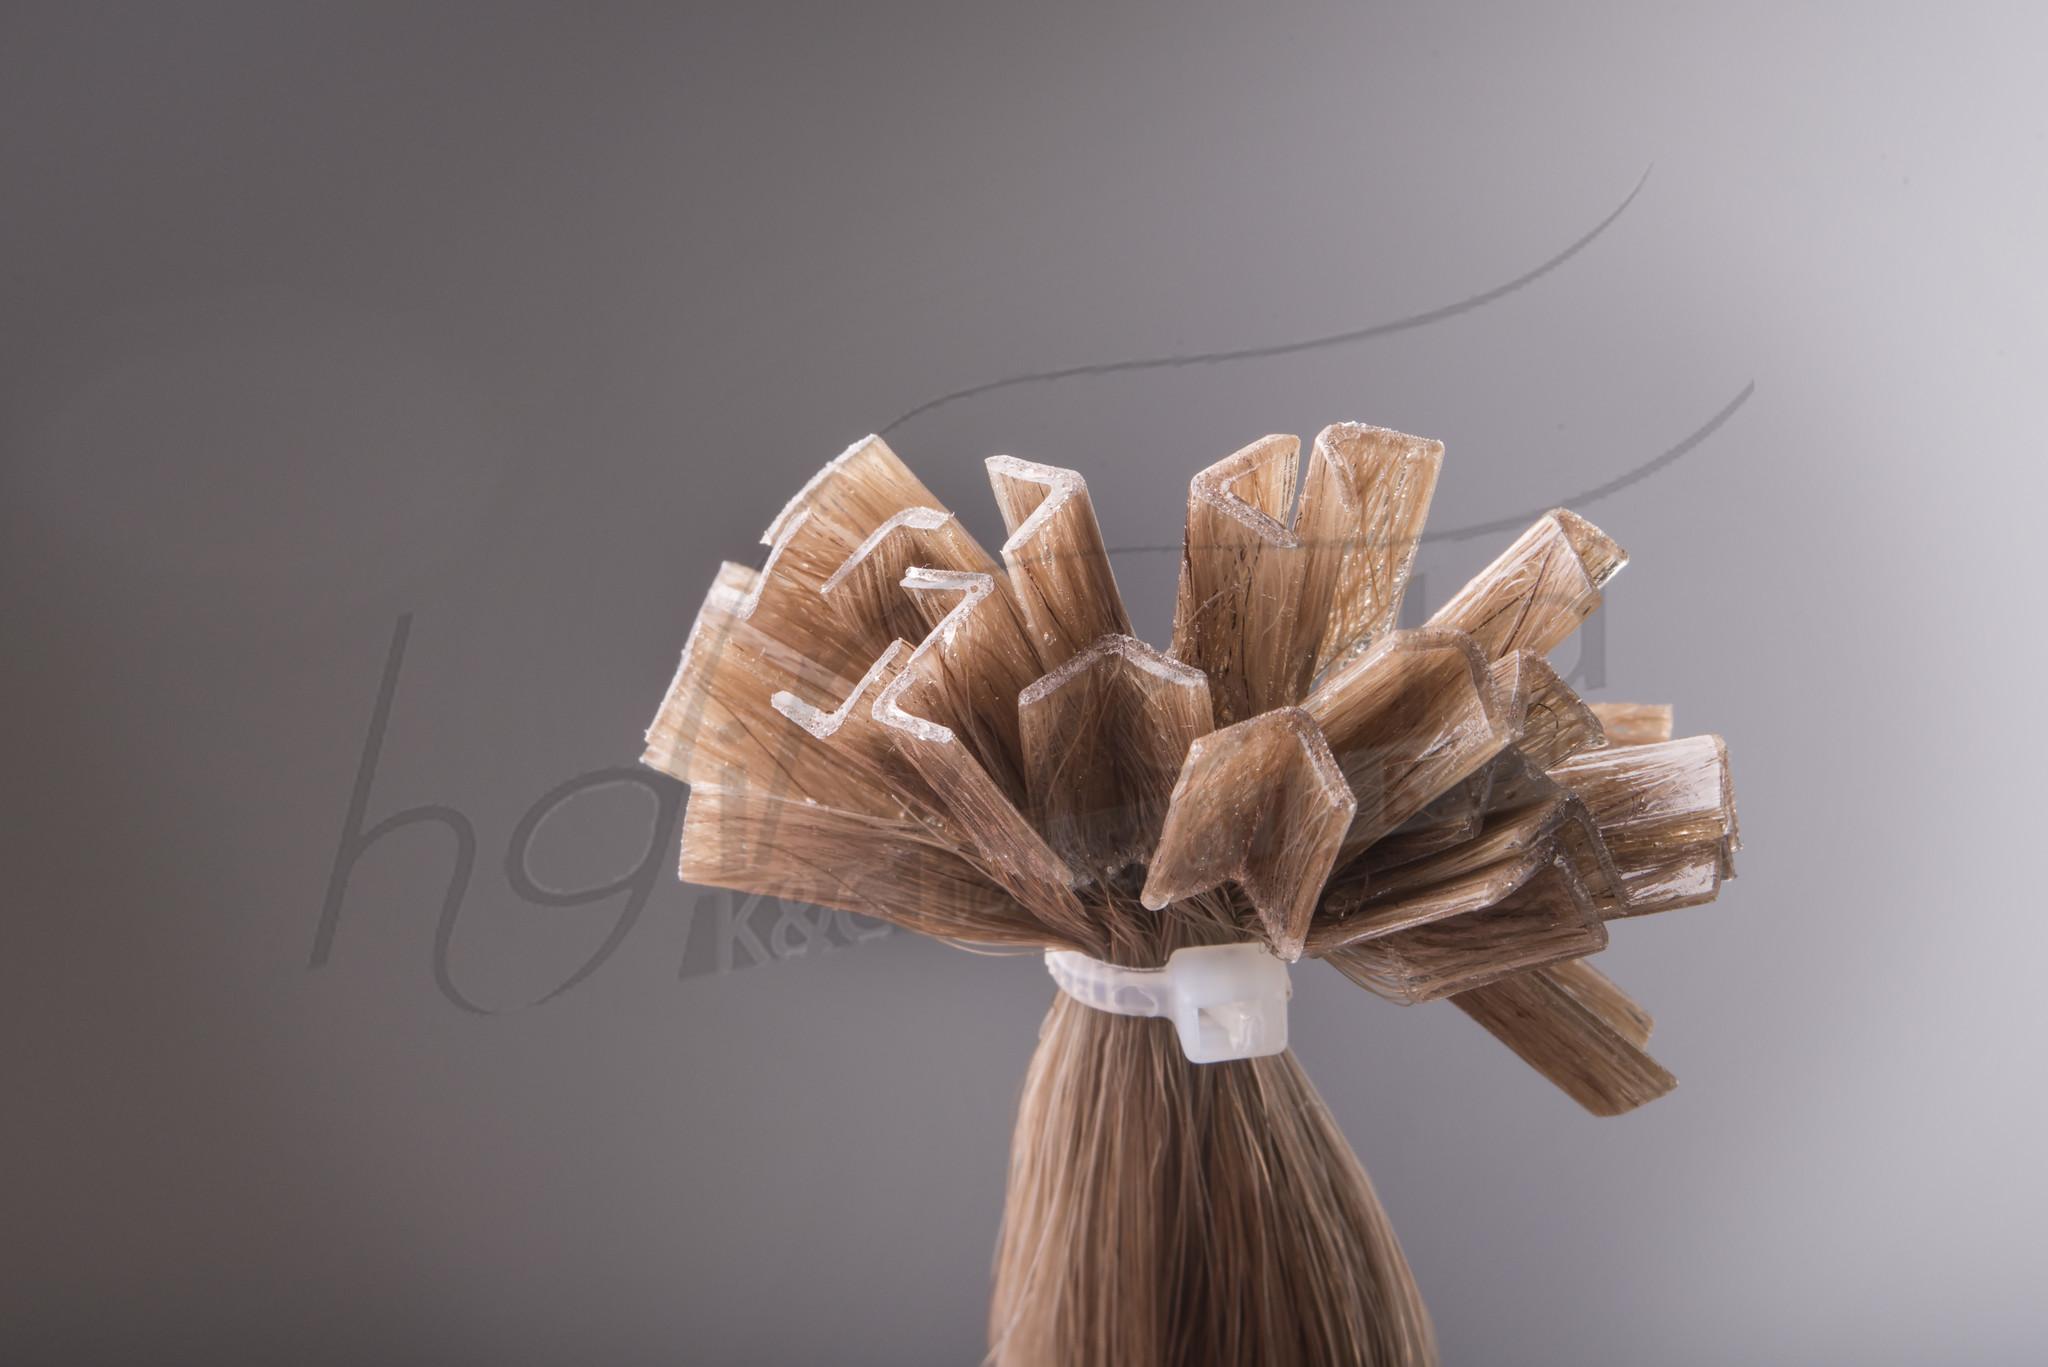 SilverFox Wax Extensions Steil  #613 Light Blonde